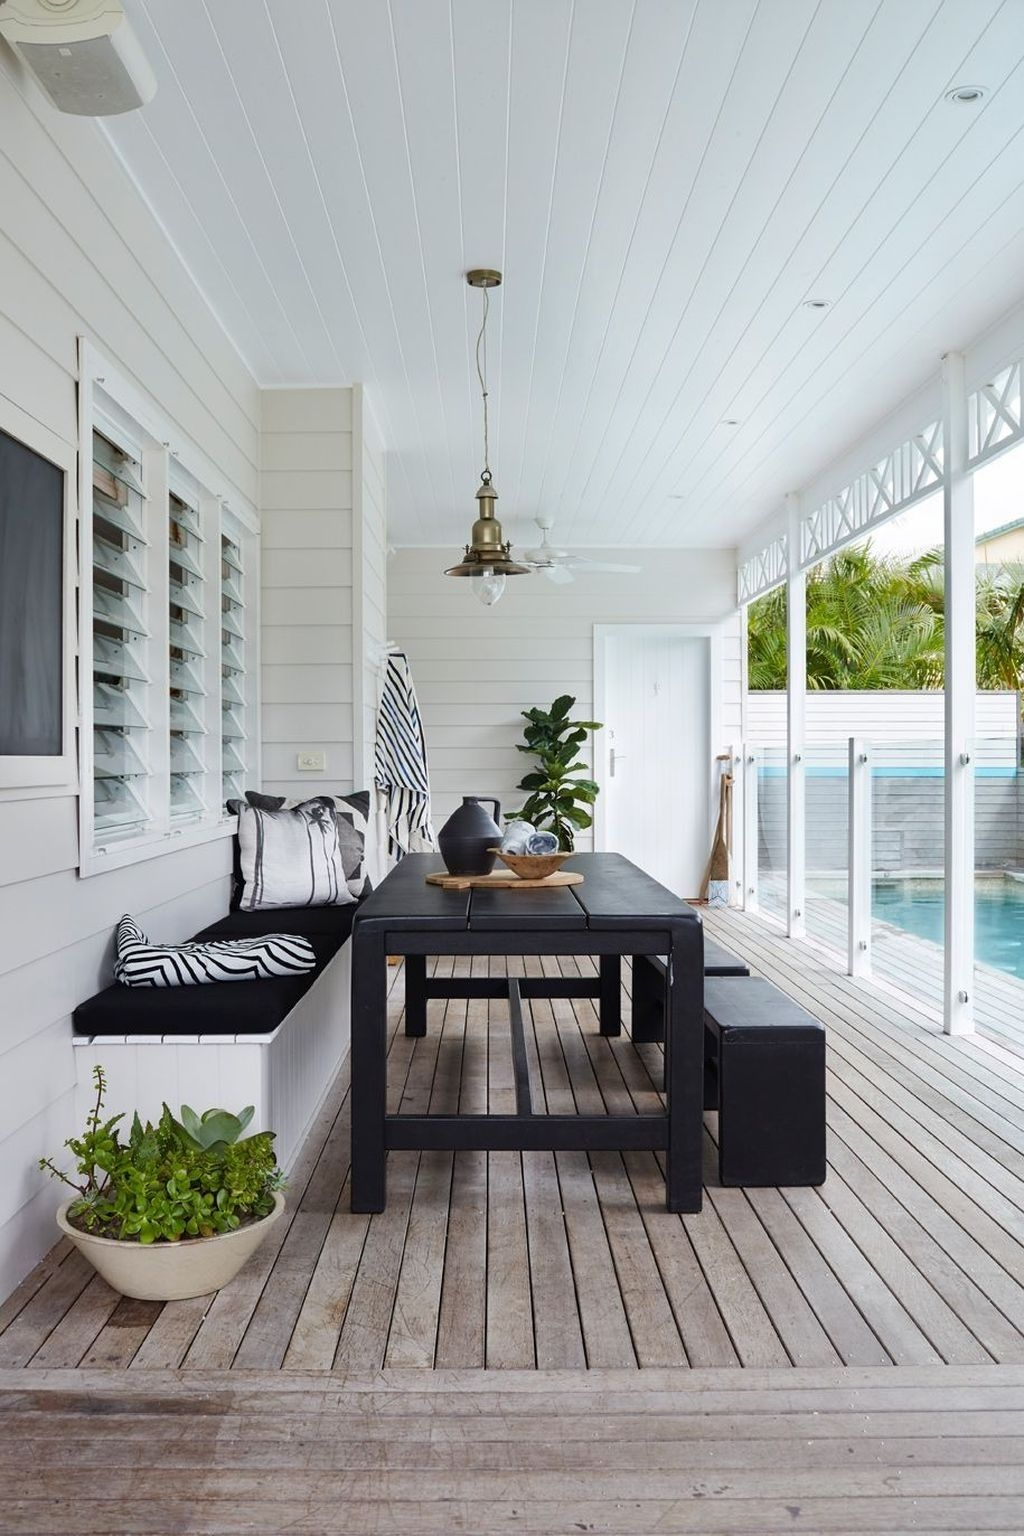 Adorable Outdoor Dining Area Furniture Ideas 18